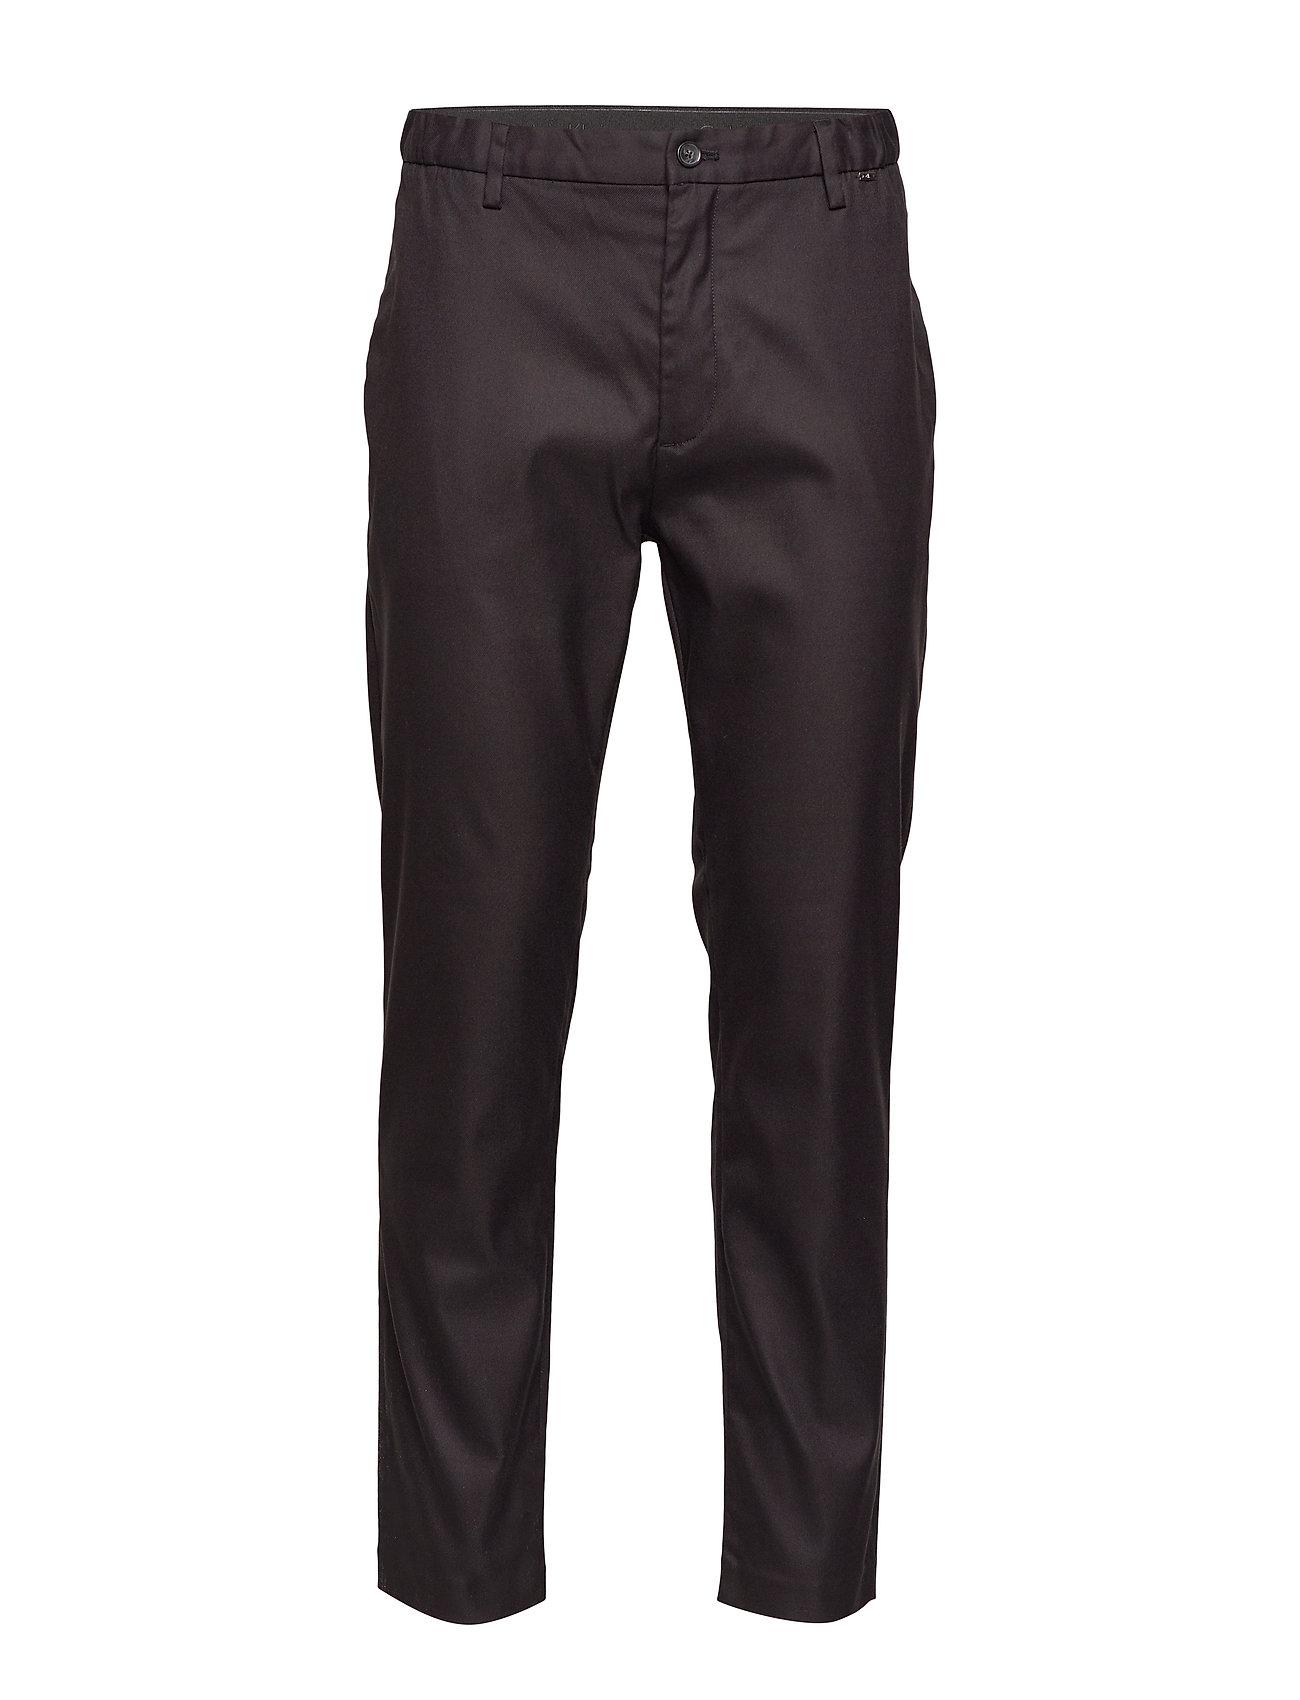 Calvin Klein TAPERED ELASTIC TWILL PANT - CALVIN BLACK